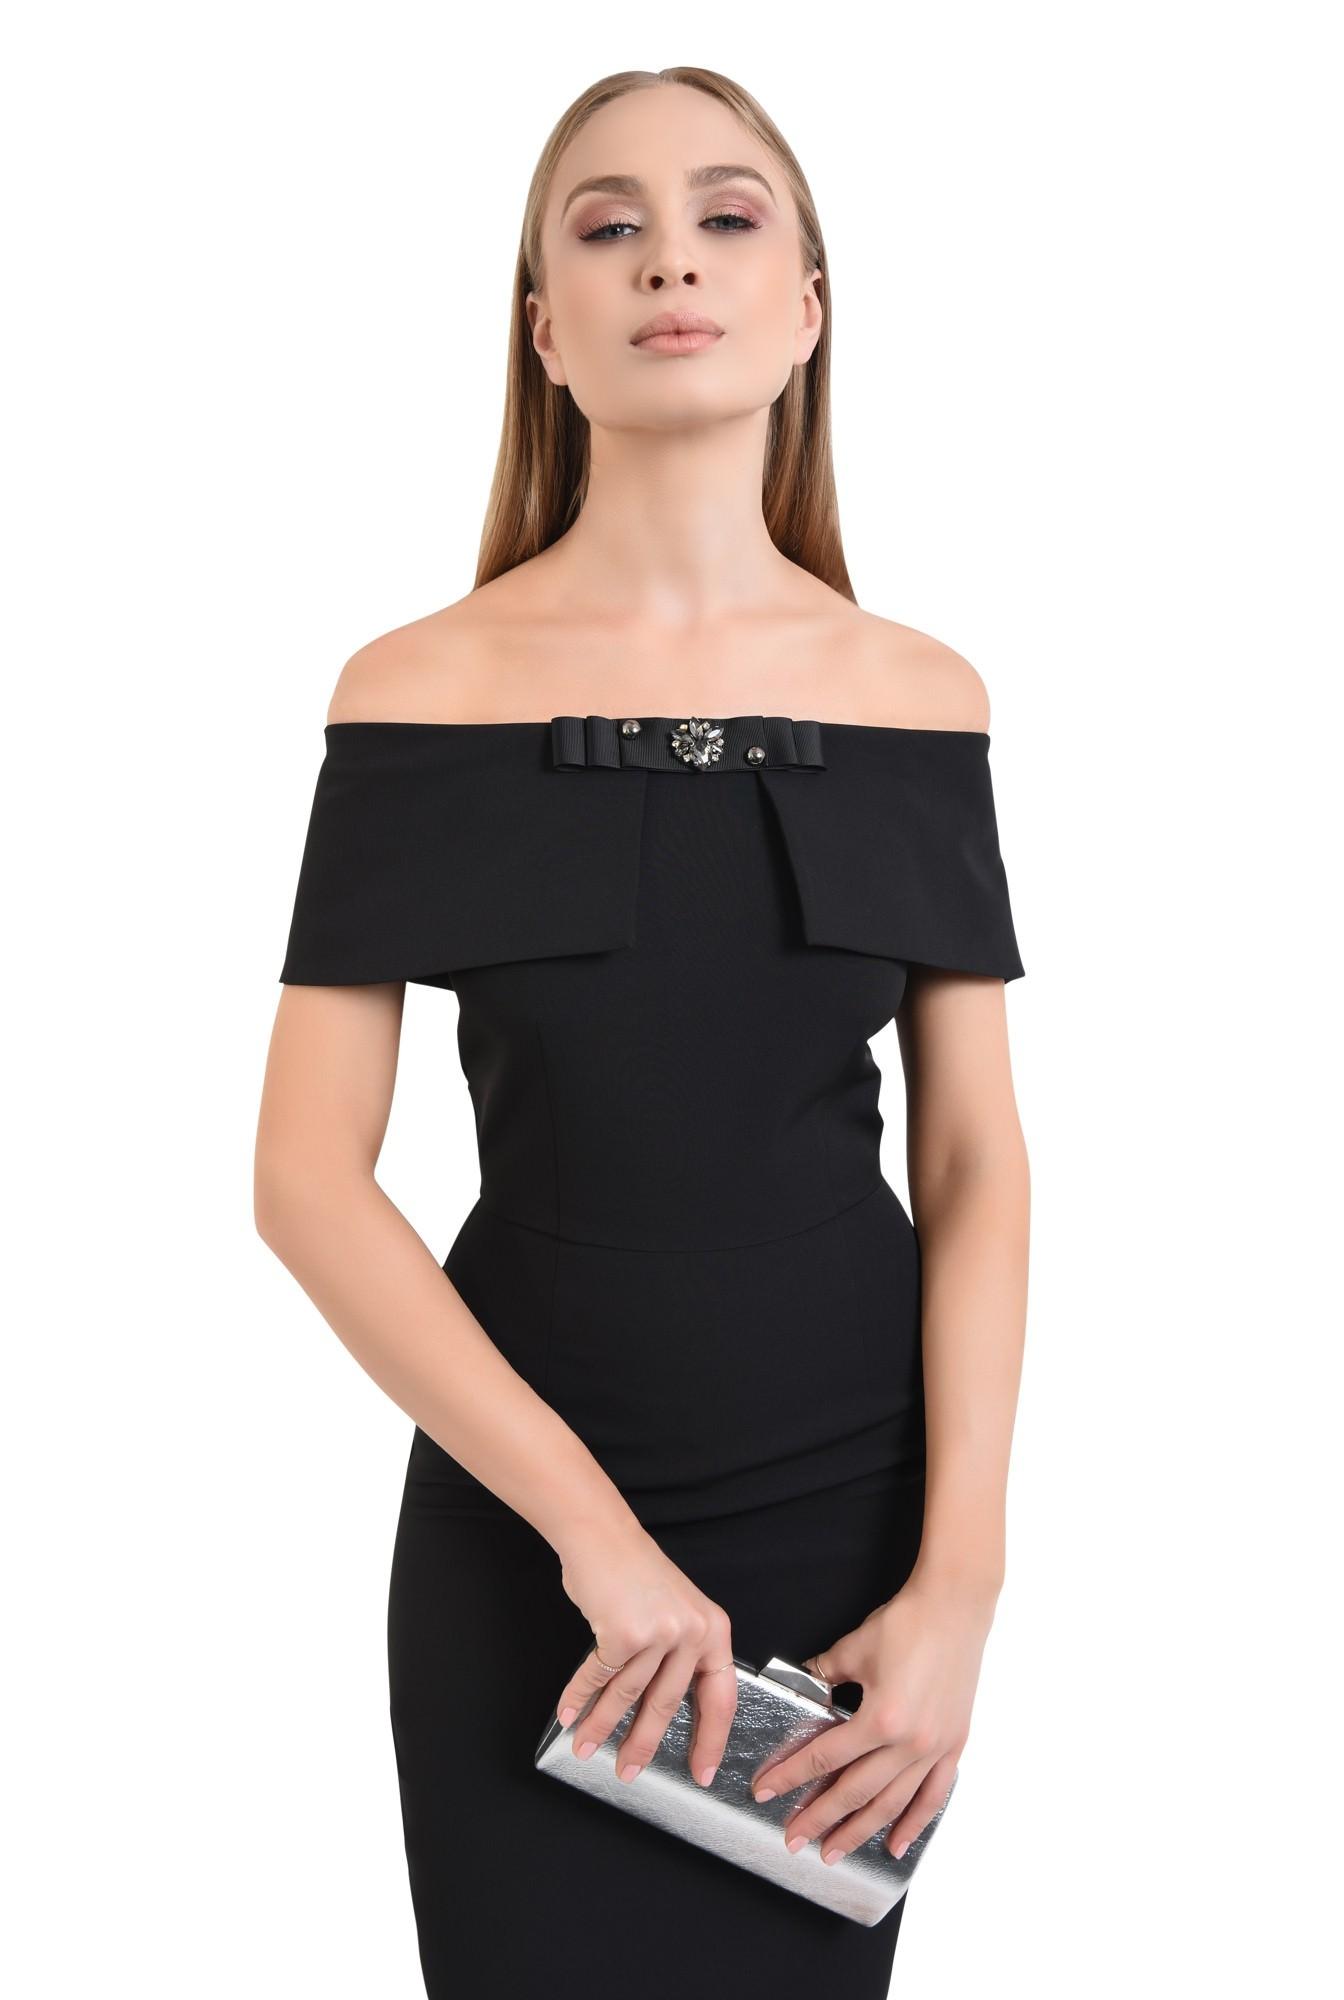 0 - rochie de seara, neagra, conica, cu funda